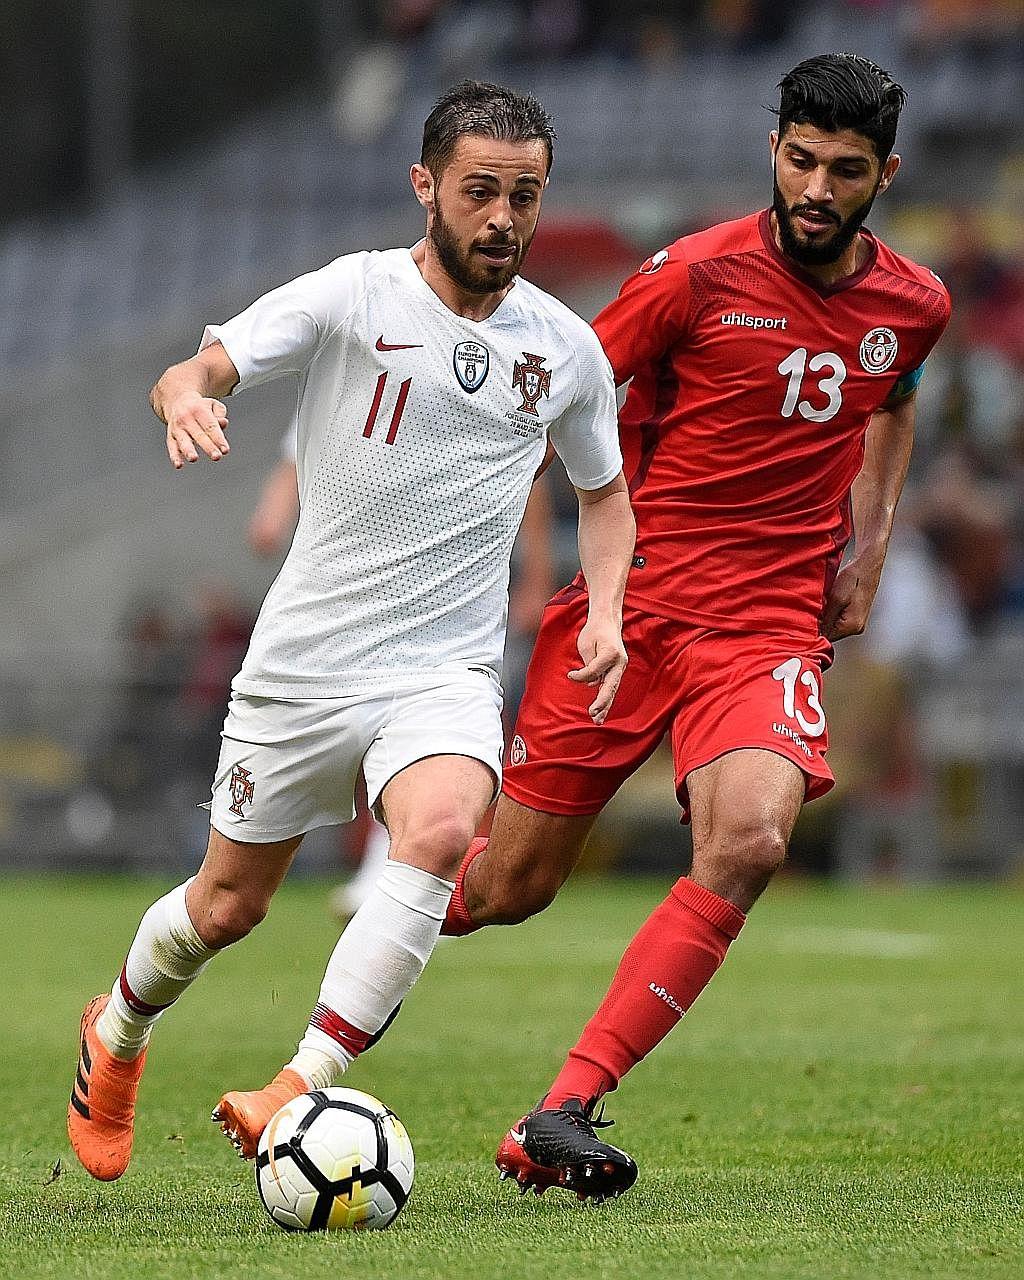 Portugal forward Bernardo Silva (left) being challenged by Tunisia midfielder Ferjani Sassi in their friendly match on Monday.